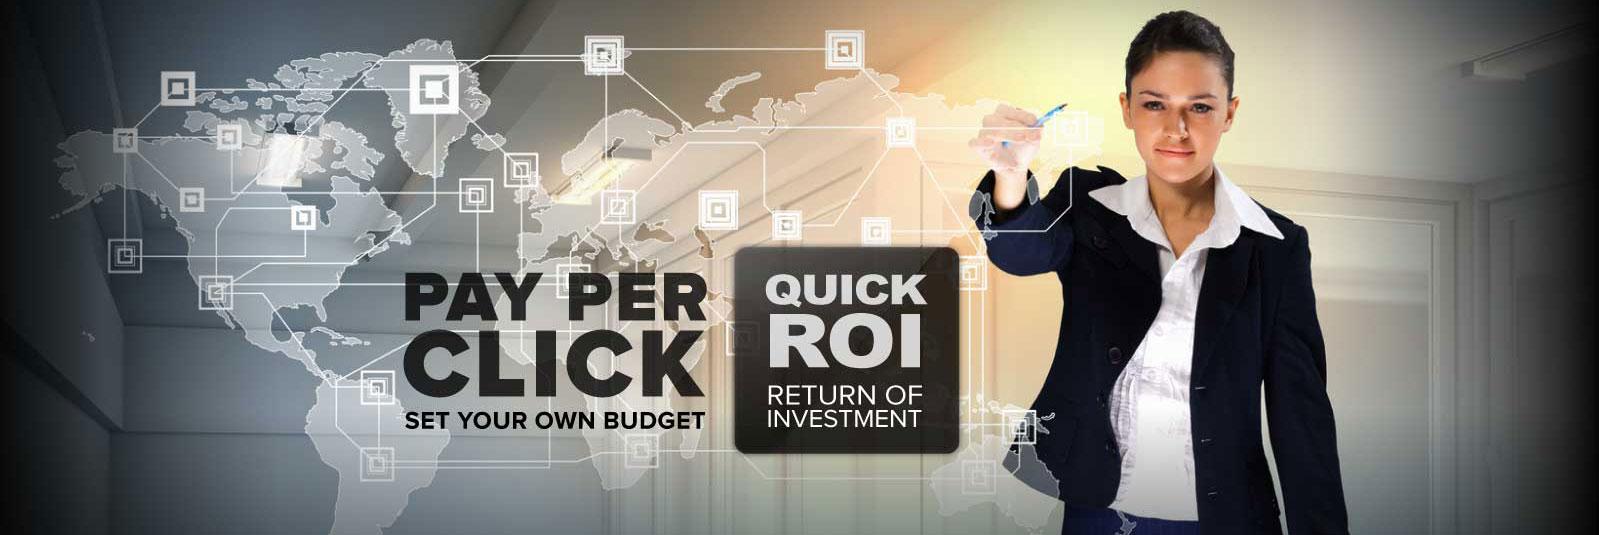 pay per click ad campaigns - Backlinkfy